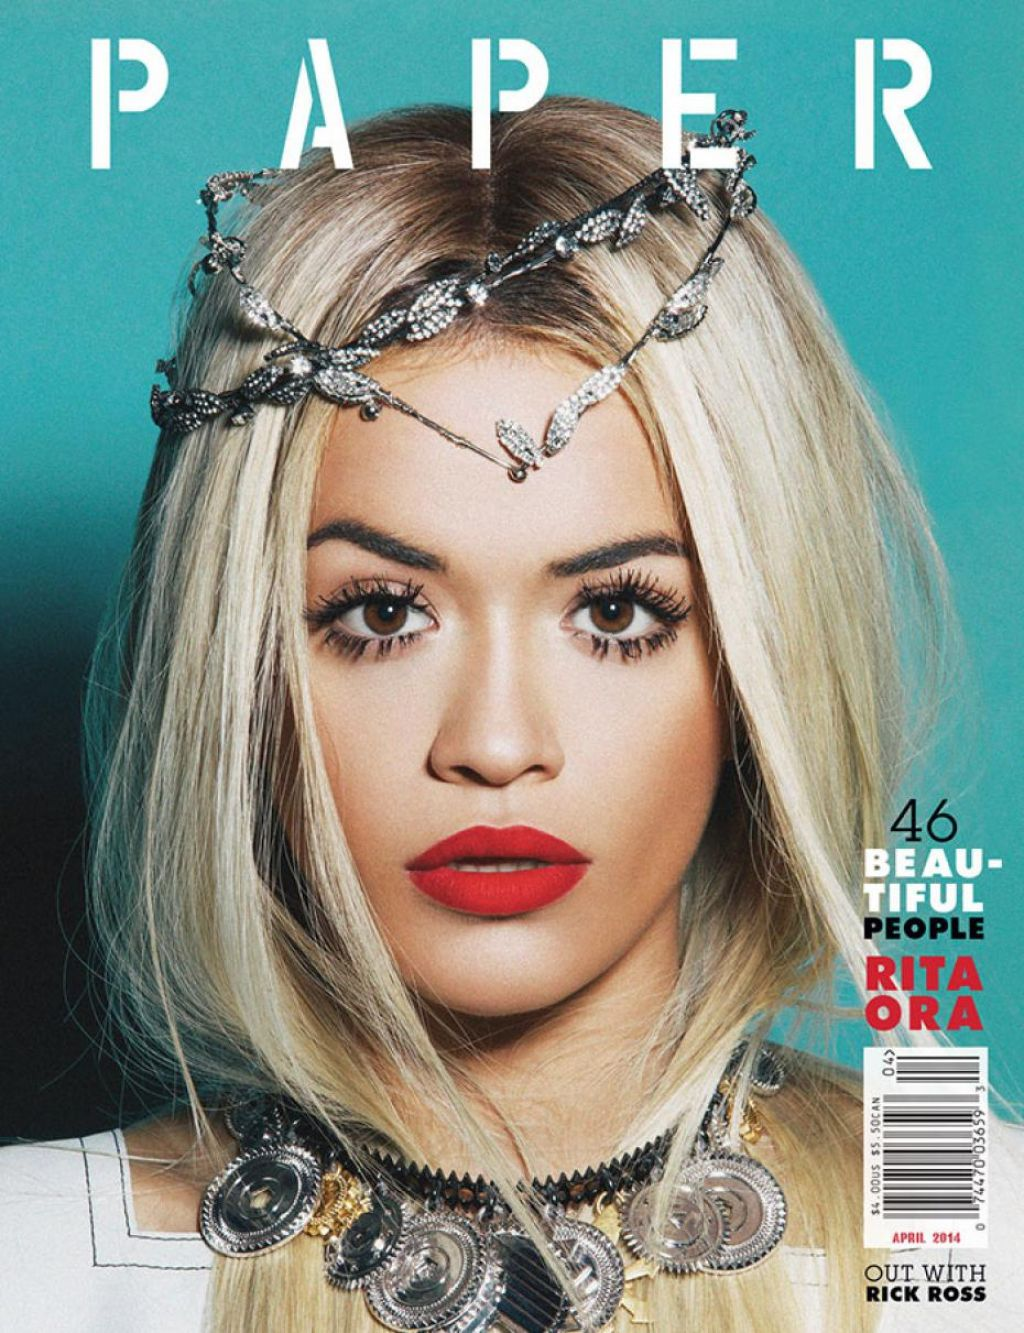 Paper Magazine April 2014 Issue